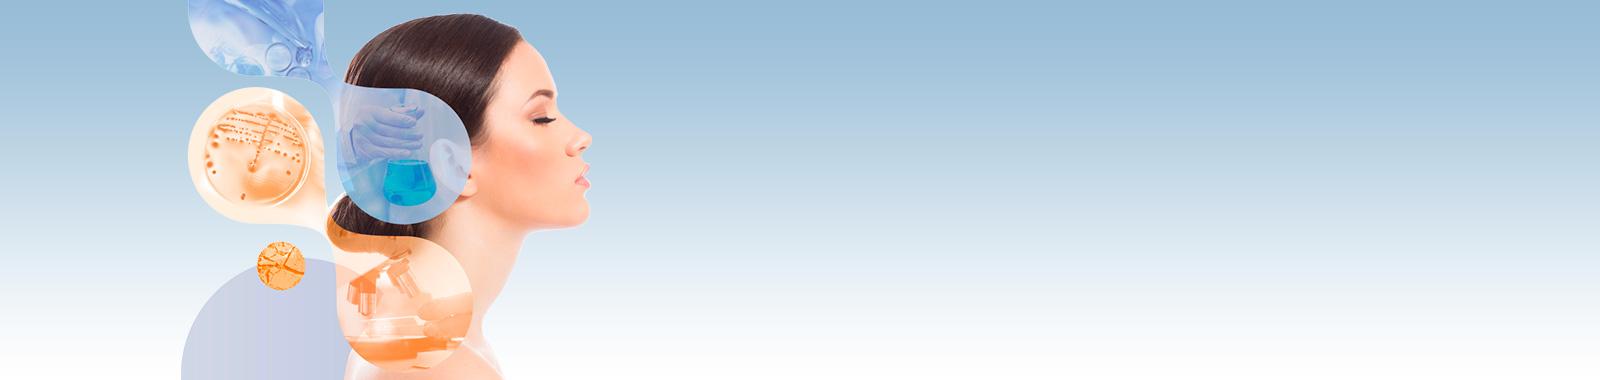 Eurofins Consumer Product Testing Careers